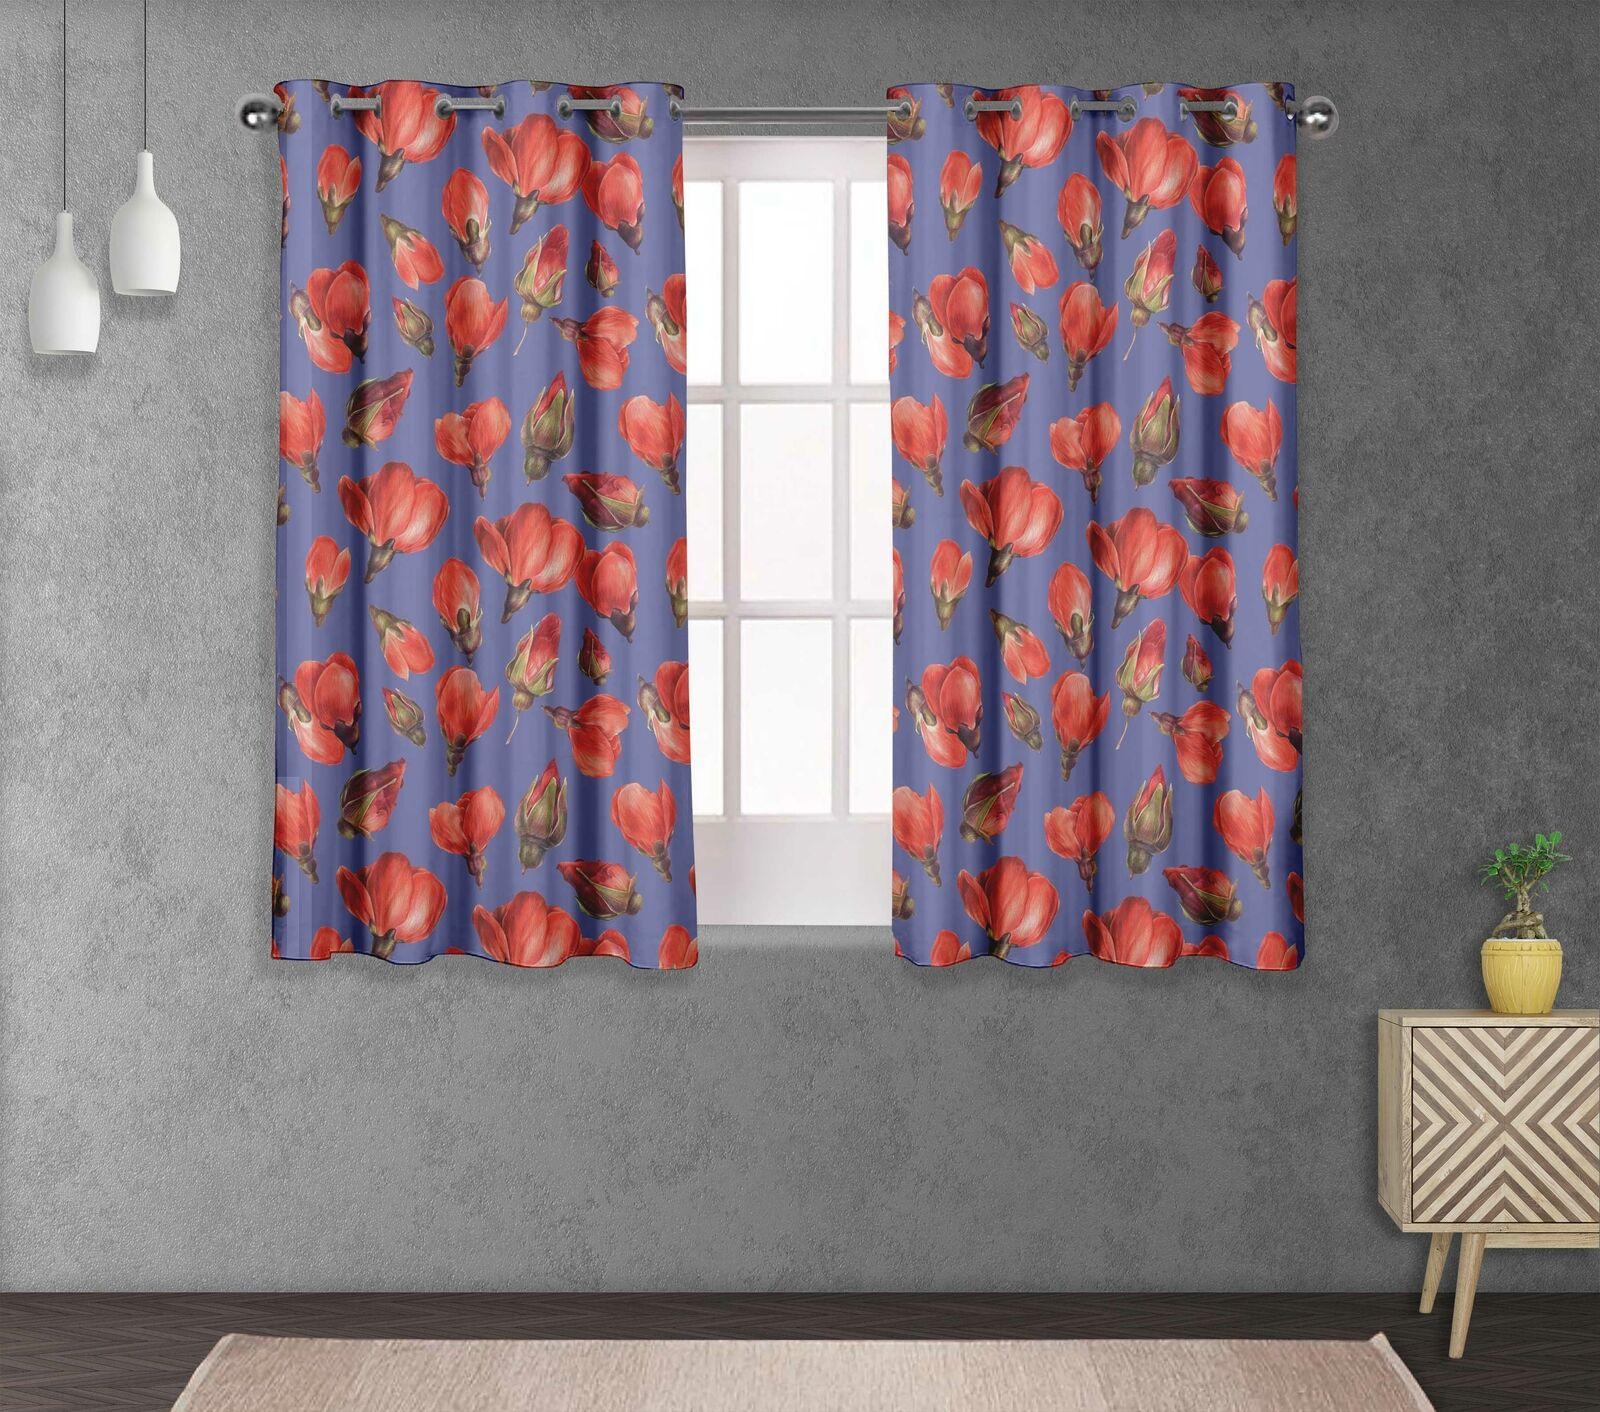 S4sassy Buds & Magnolia Living Room Eyelet Curtain Drapers -FL-847B